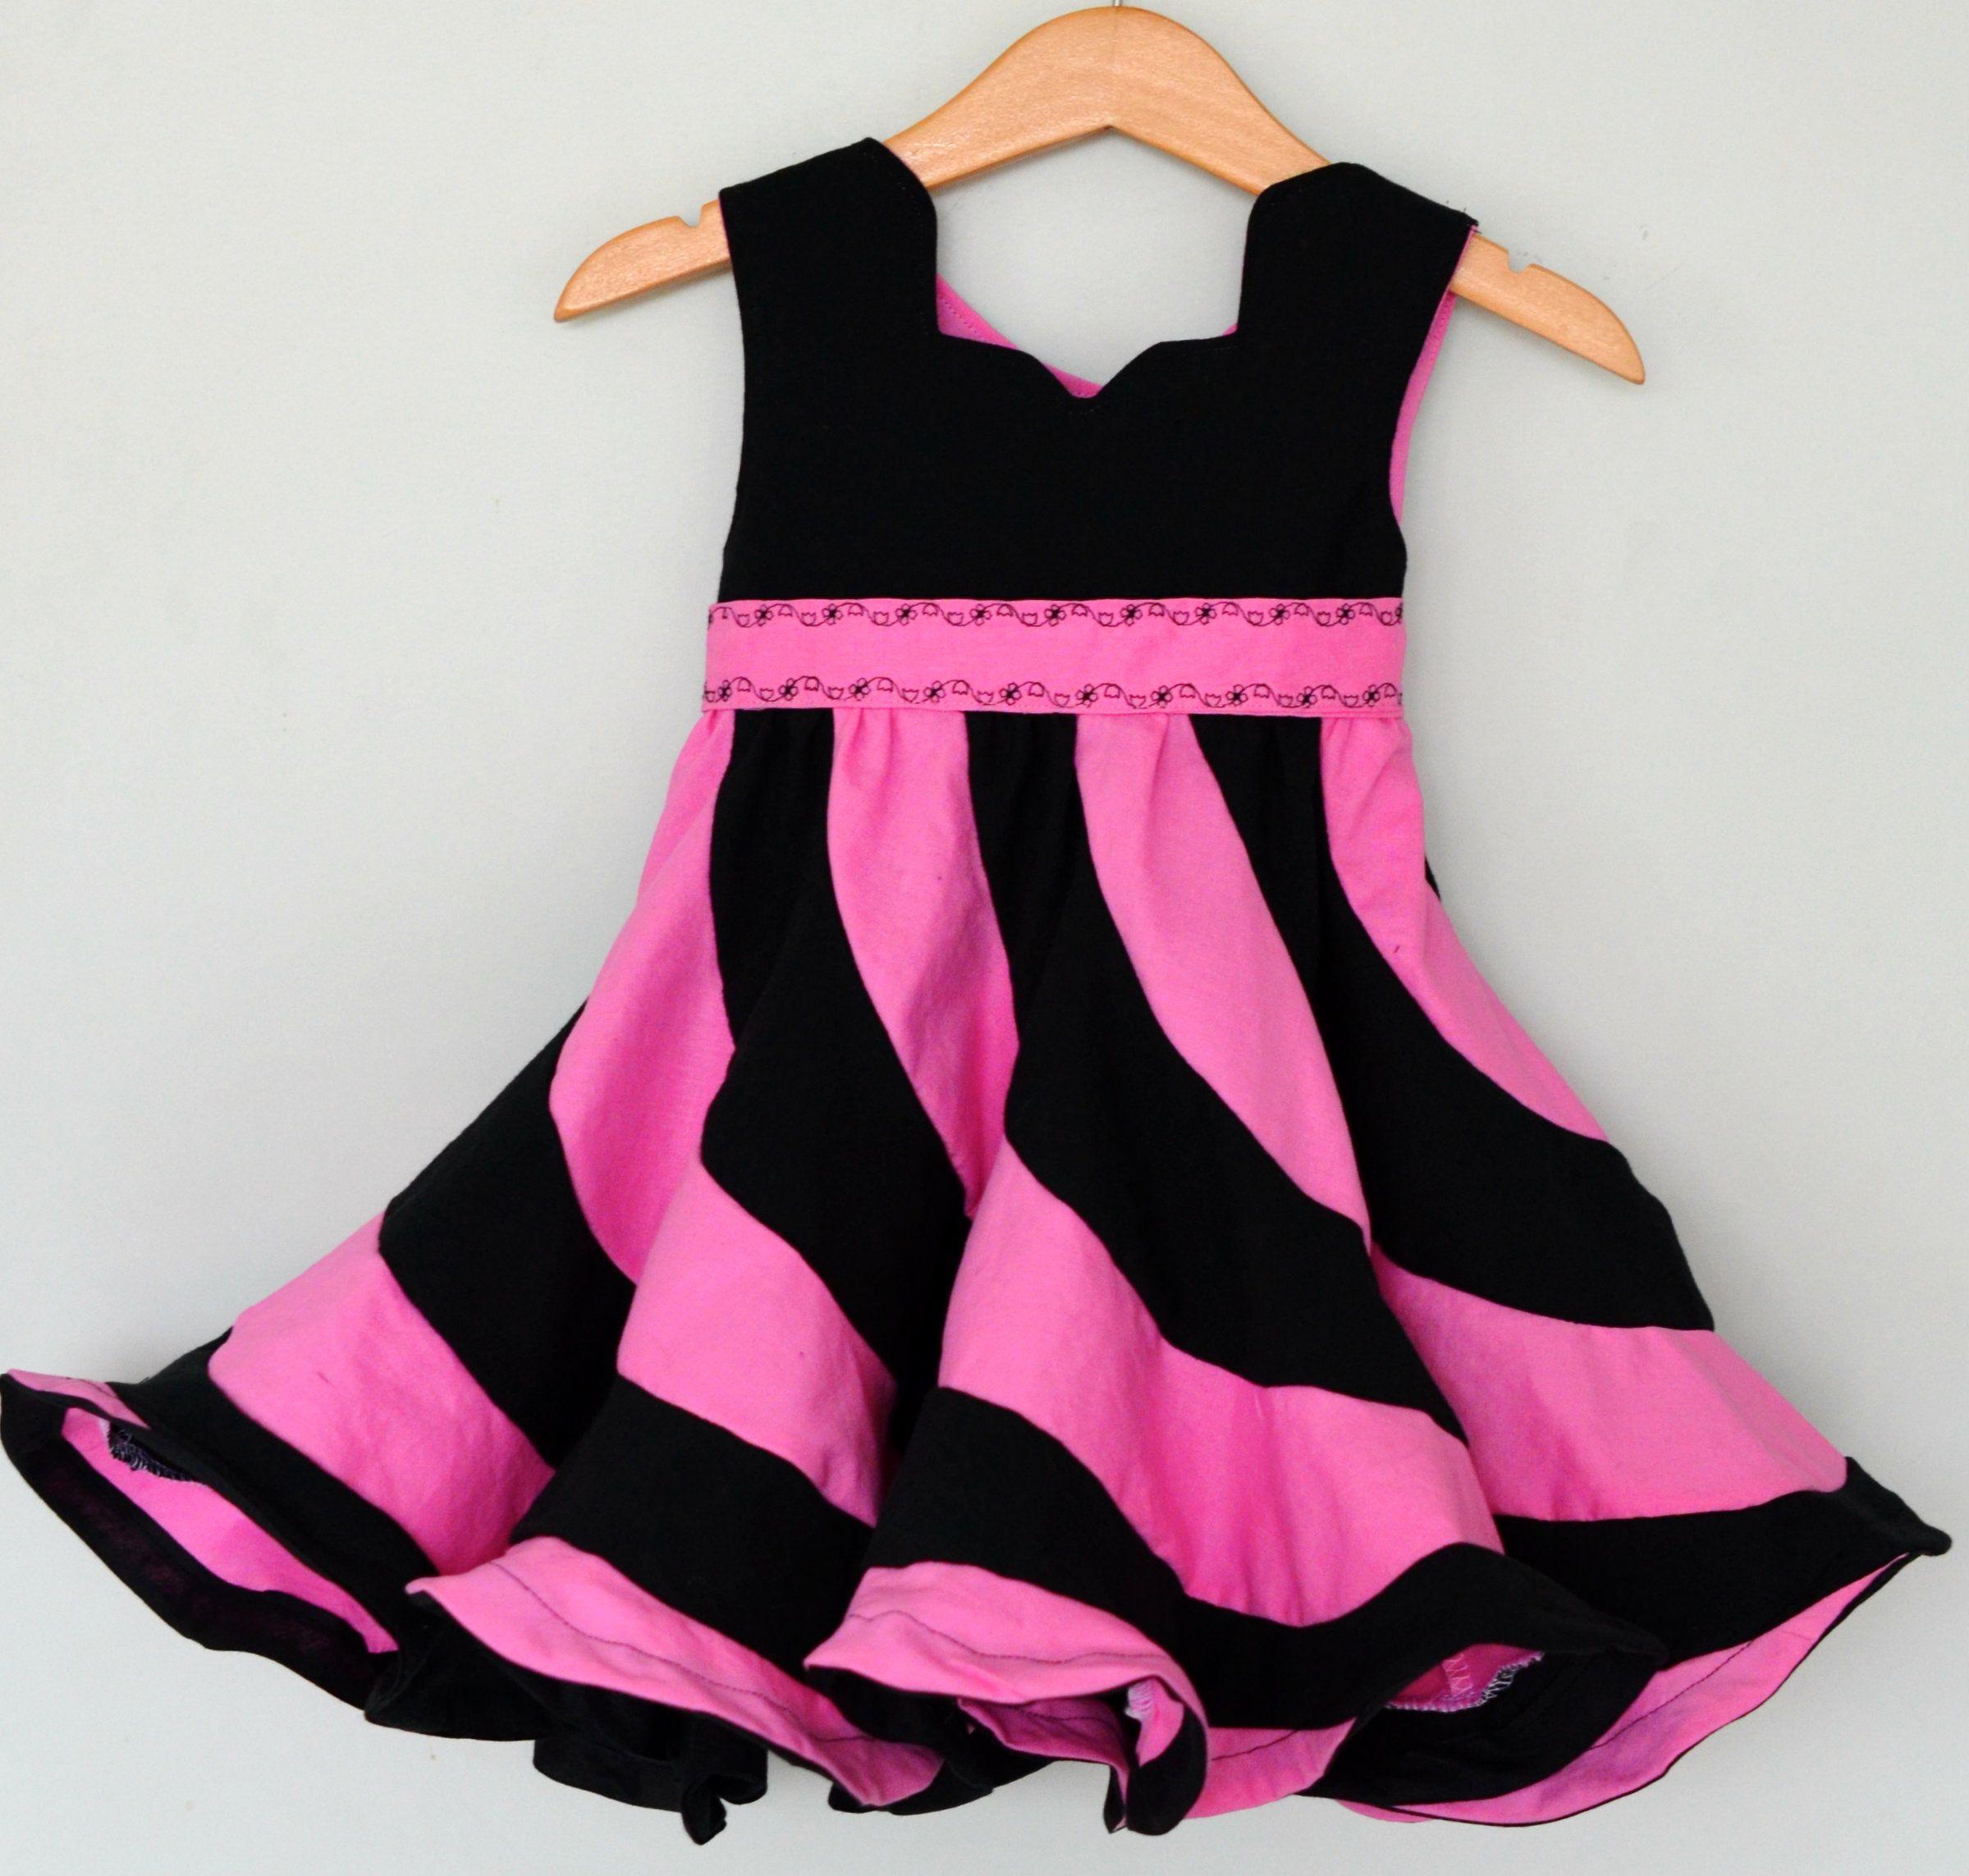 Peppermint swirl dress pattern for girls the most beautiful pink peppermint swirl dress pattern for girls the most beautiful pink ladies dress in the world jeuxipadfo Choice Image